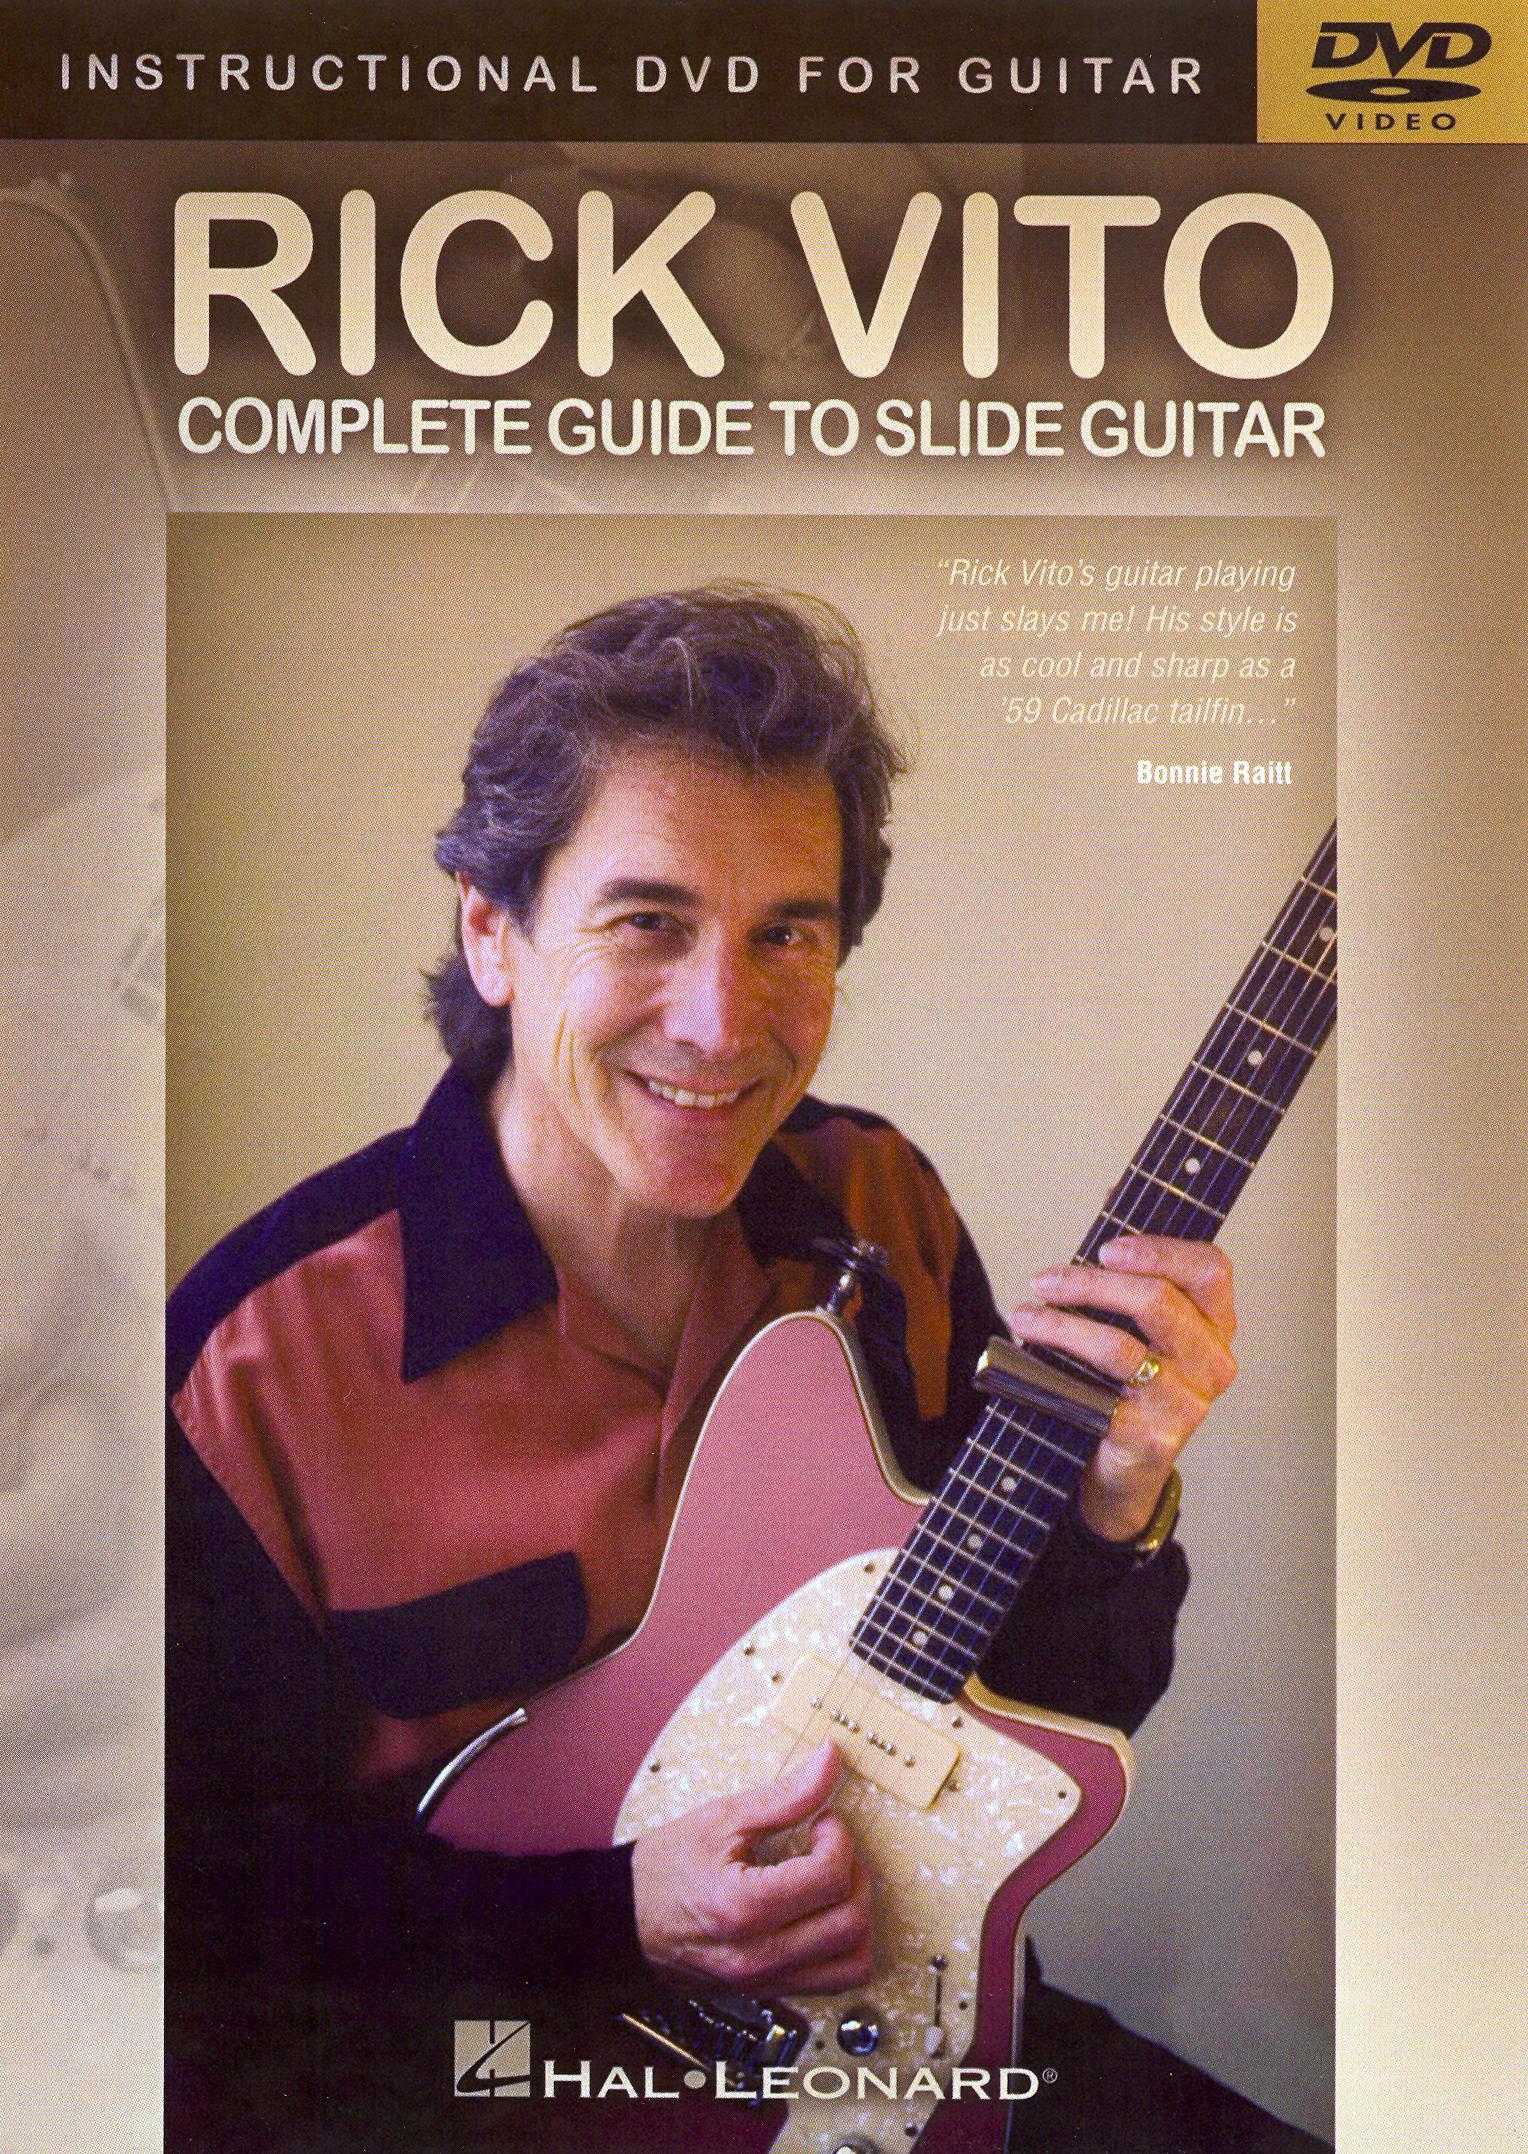 Rick Vito: Complete Guide to Slide Guitar